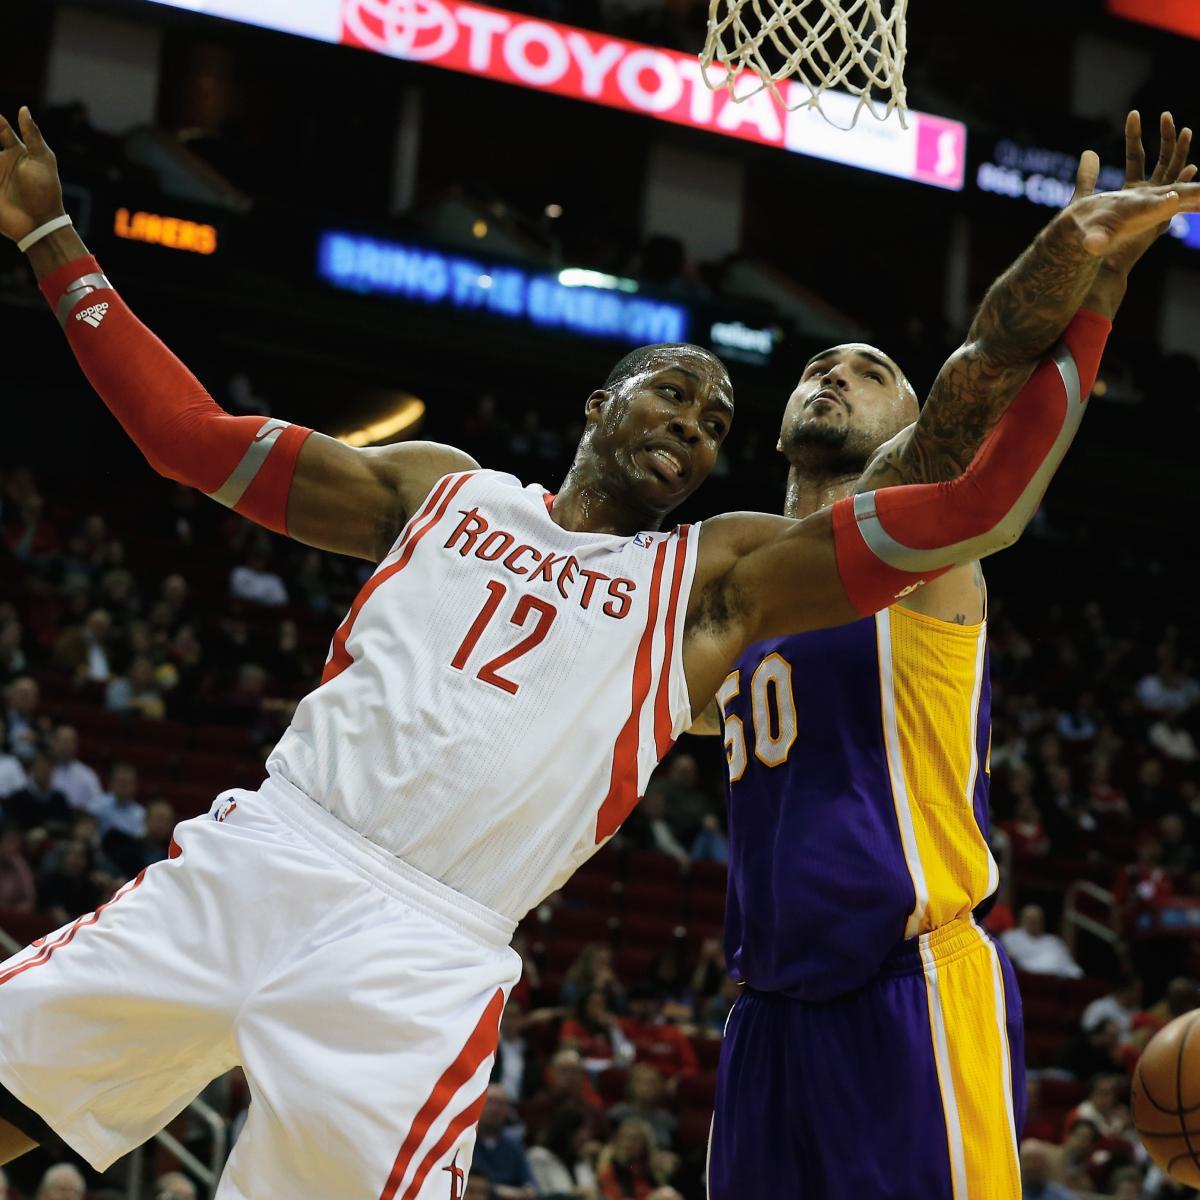 Houston Rockets X Lakers: Dwight Howard's Girlfriend Has Laker Hater Shirt For